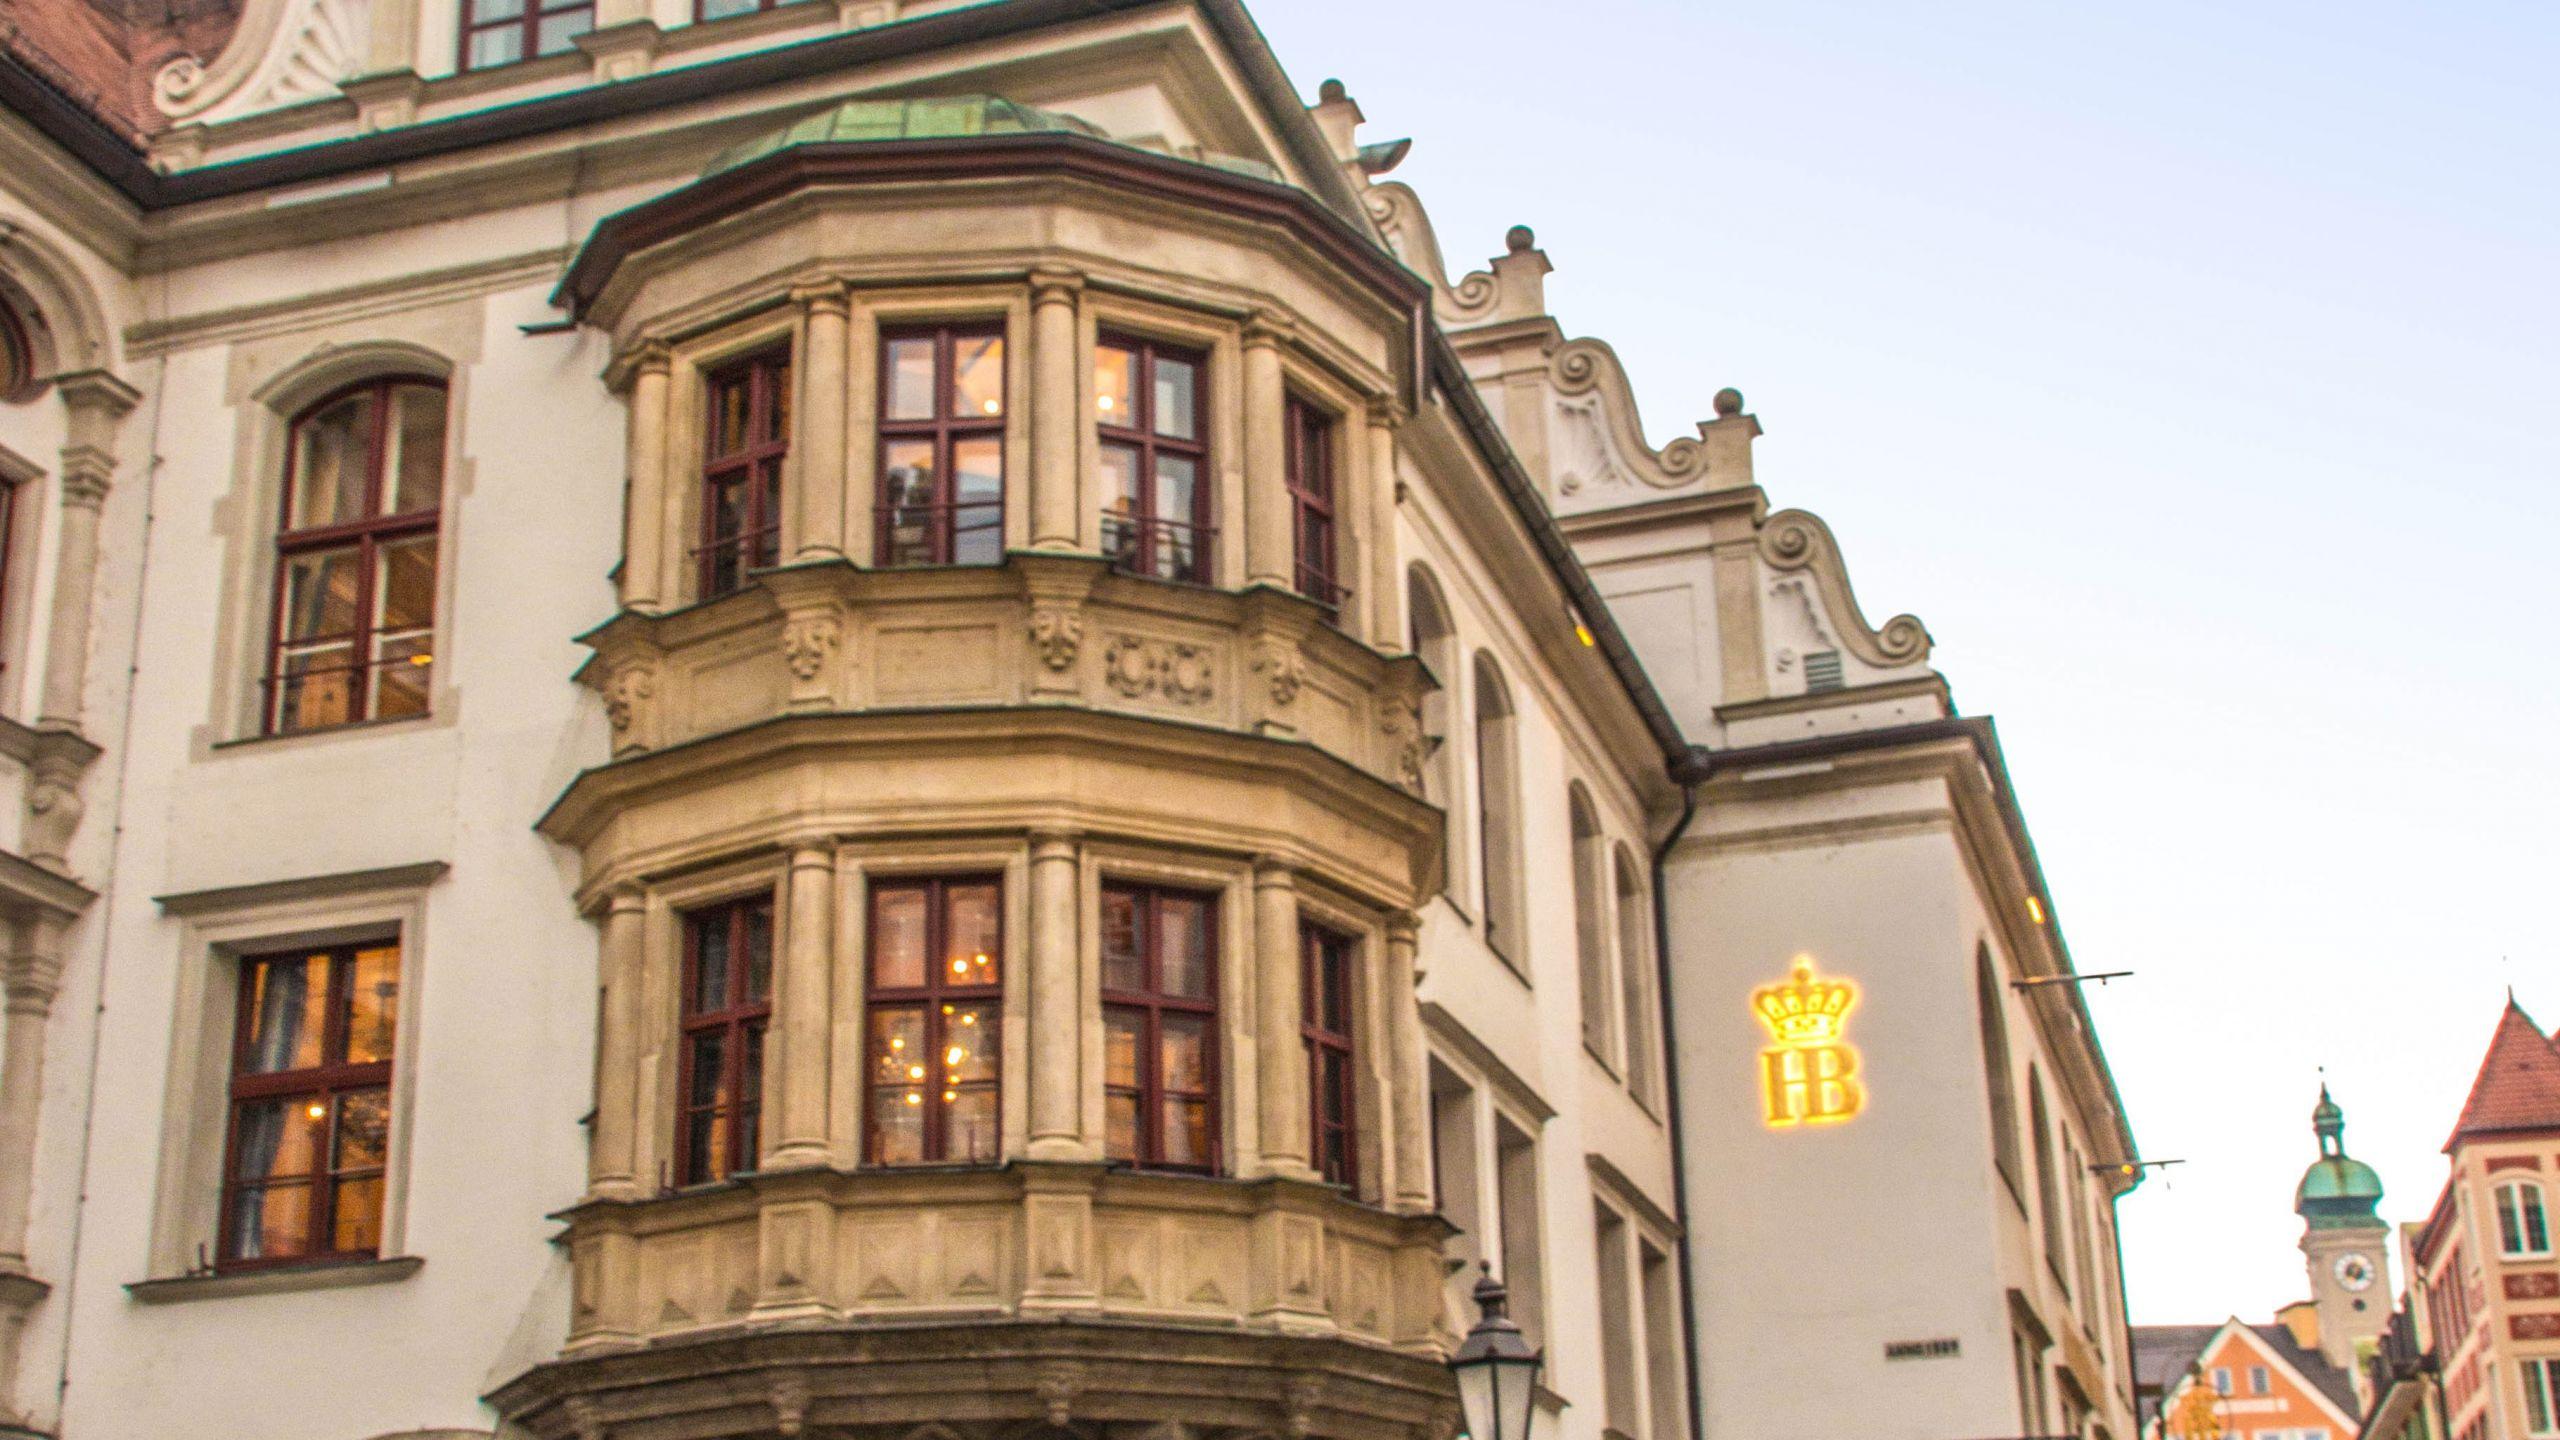 Giesinger Garten Luxus tour the Brewery Of the Hofbrauhaus